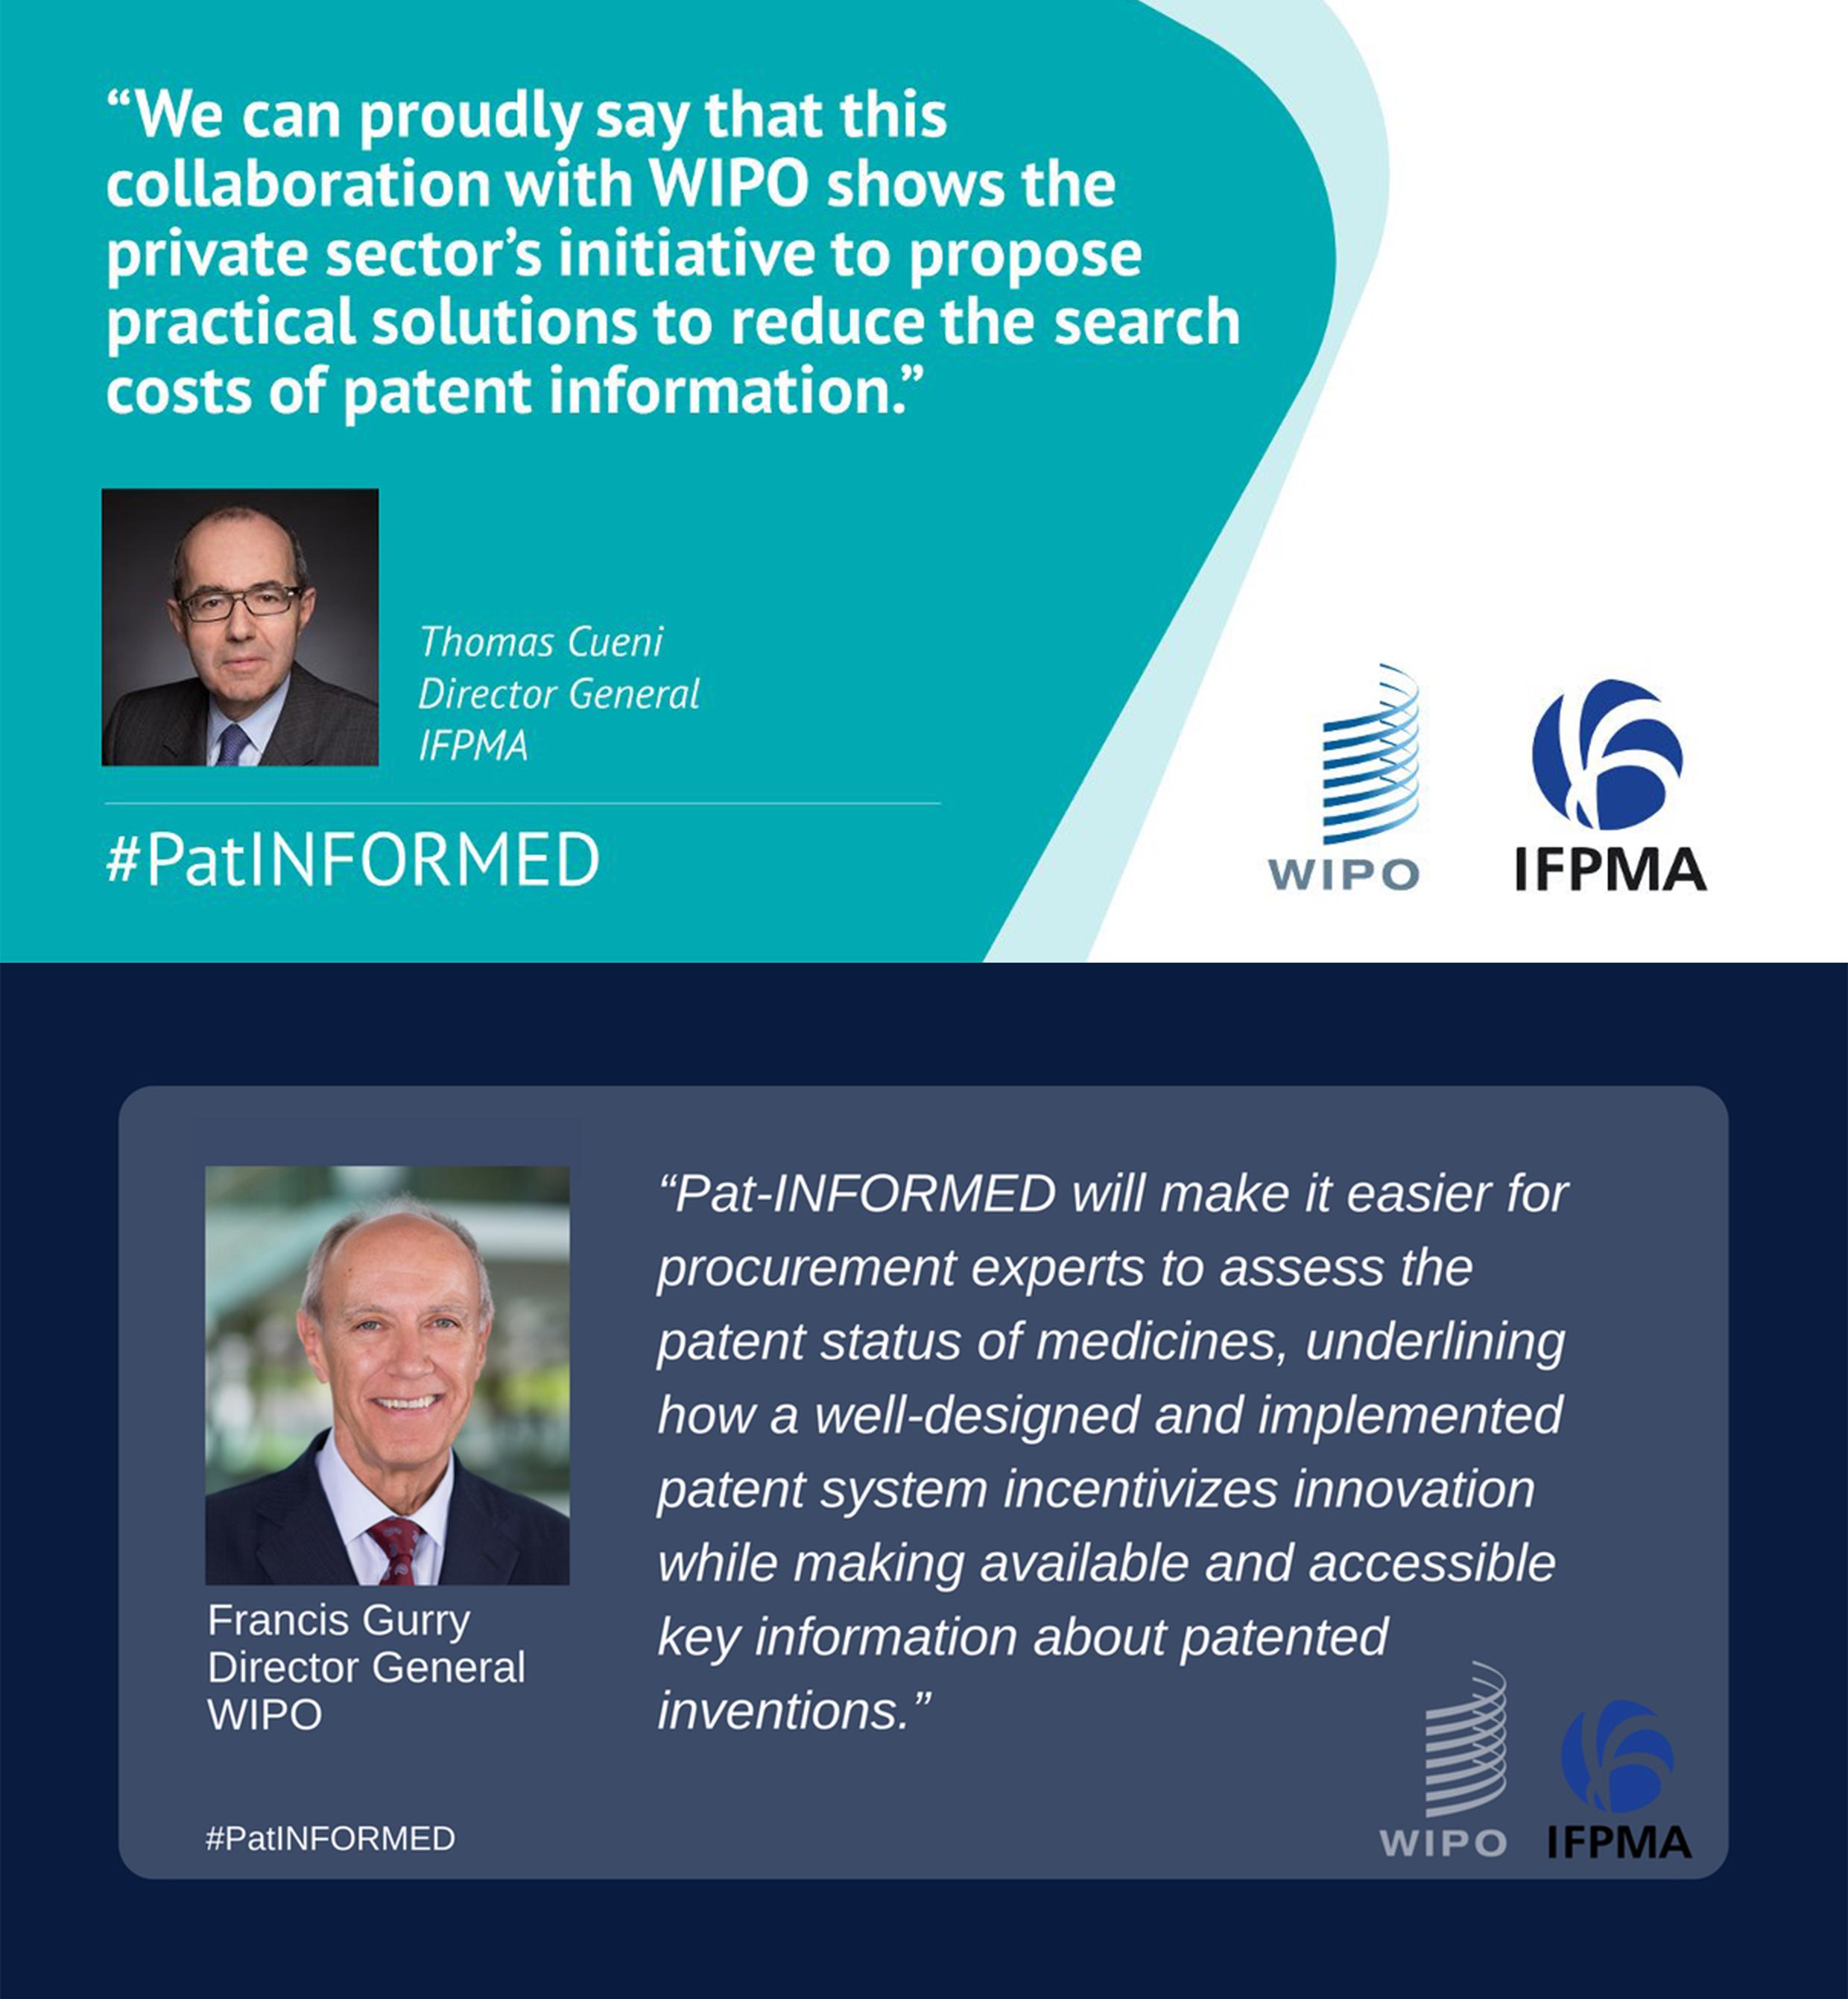 Pat-Informed WIPO IFPMA